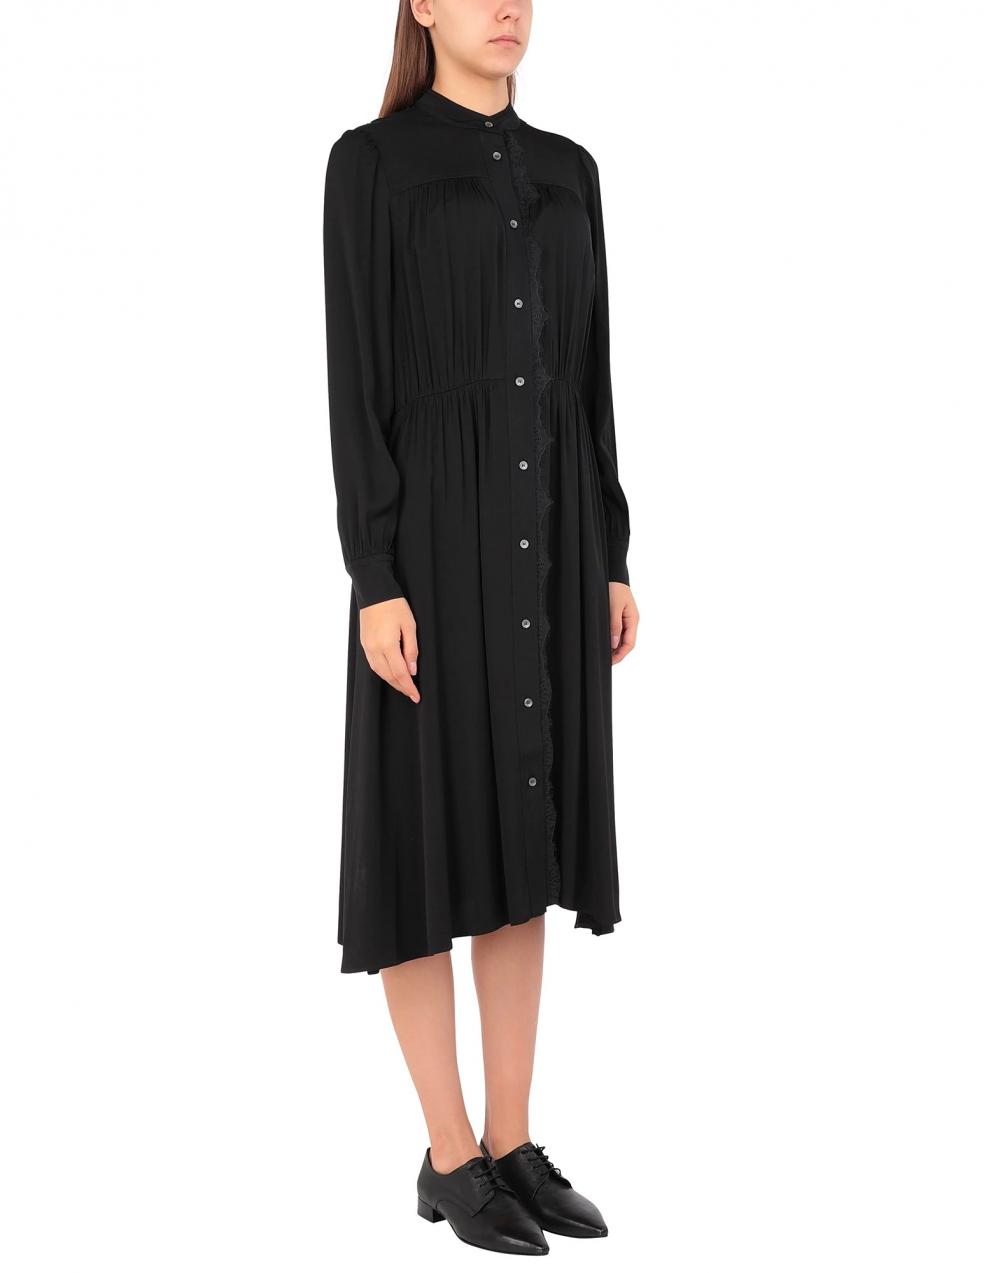 Платье-рубашка CALVIN KLEIN LS LACE TRIM DRESS на 44 -46 размер